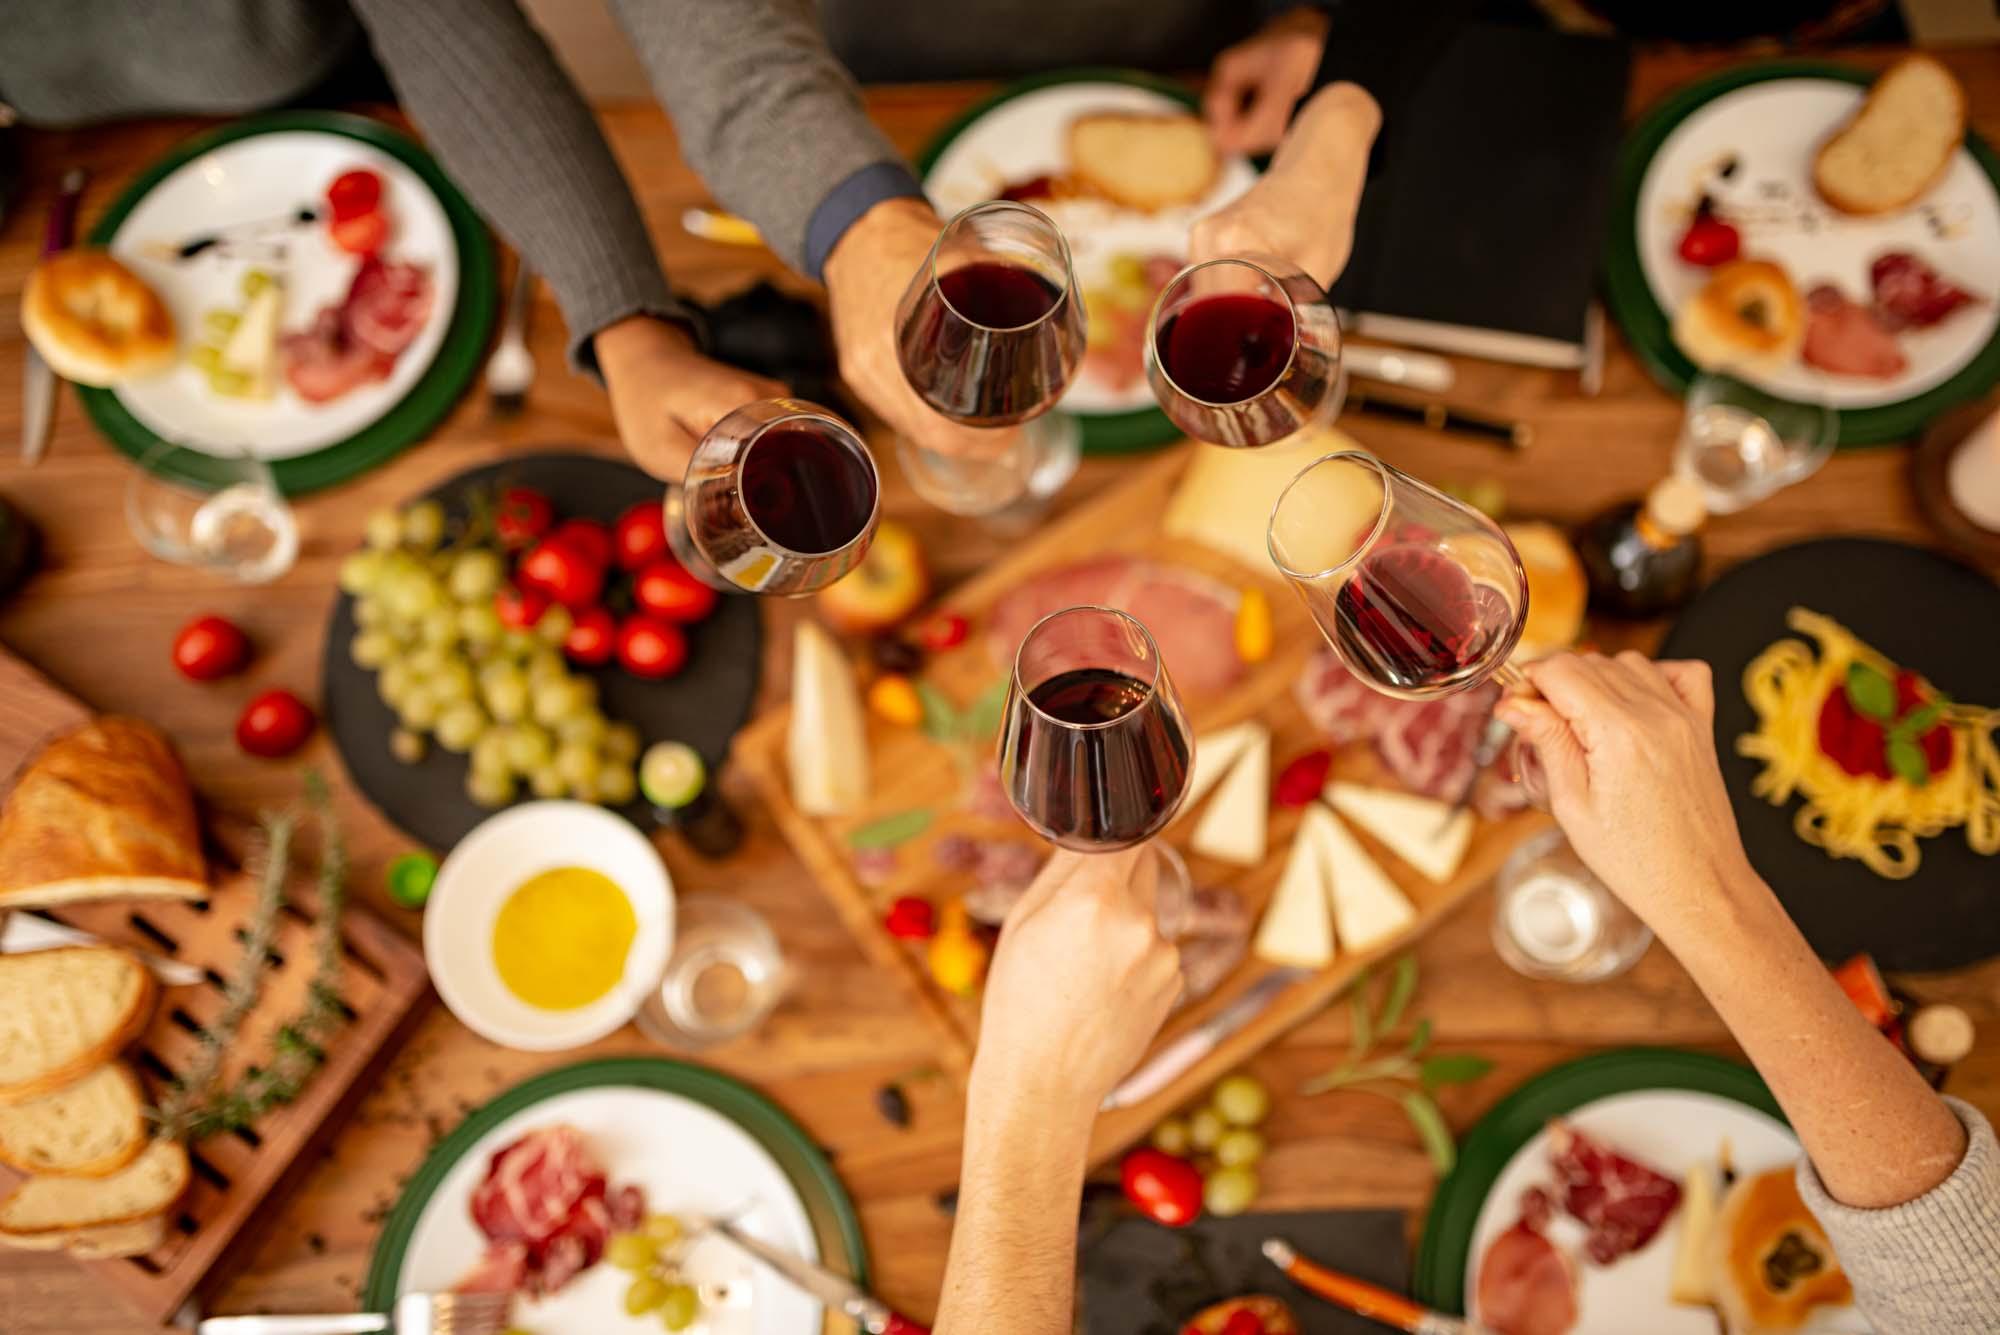 Cucina Amatoriale Cene Aziendali a Catanzaro